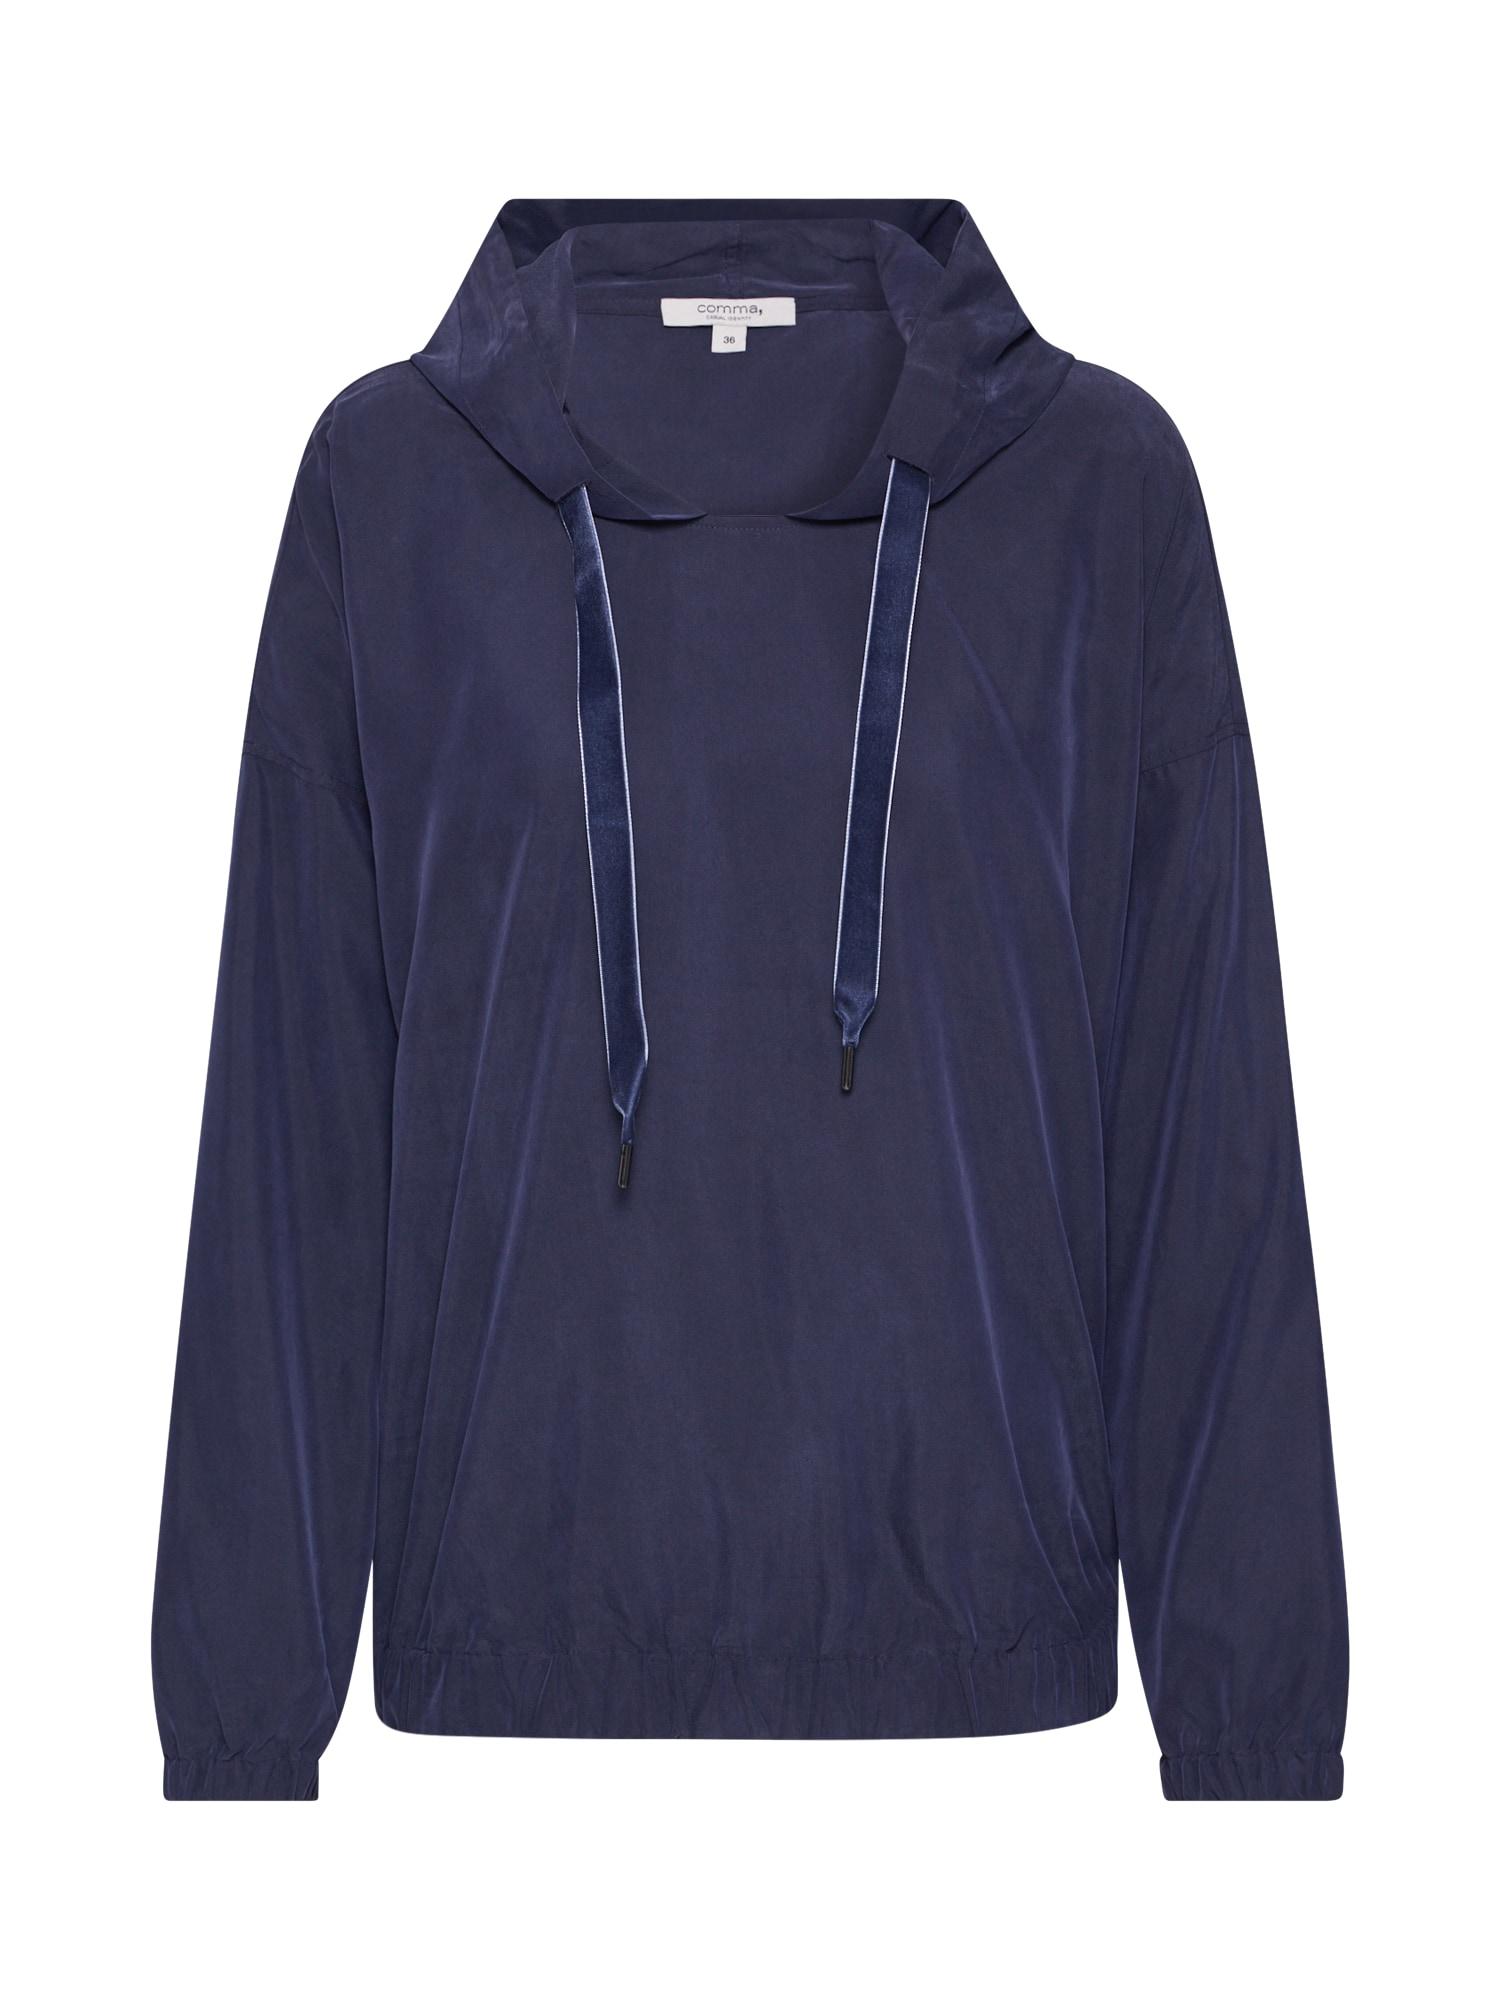 COMMA Megztinis tamsiai mėlyna jūros spalva